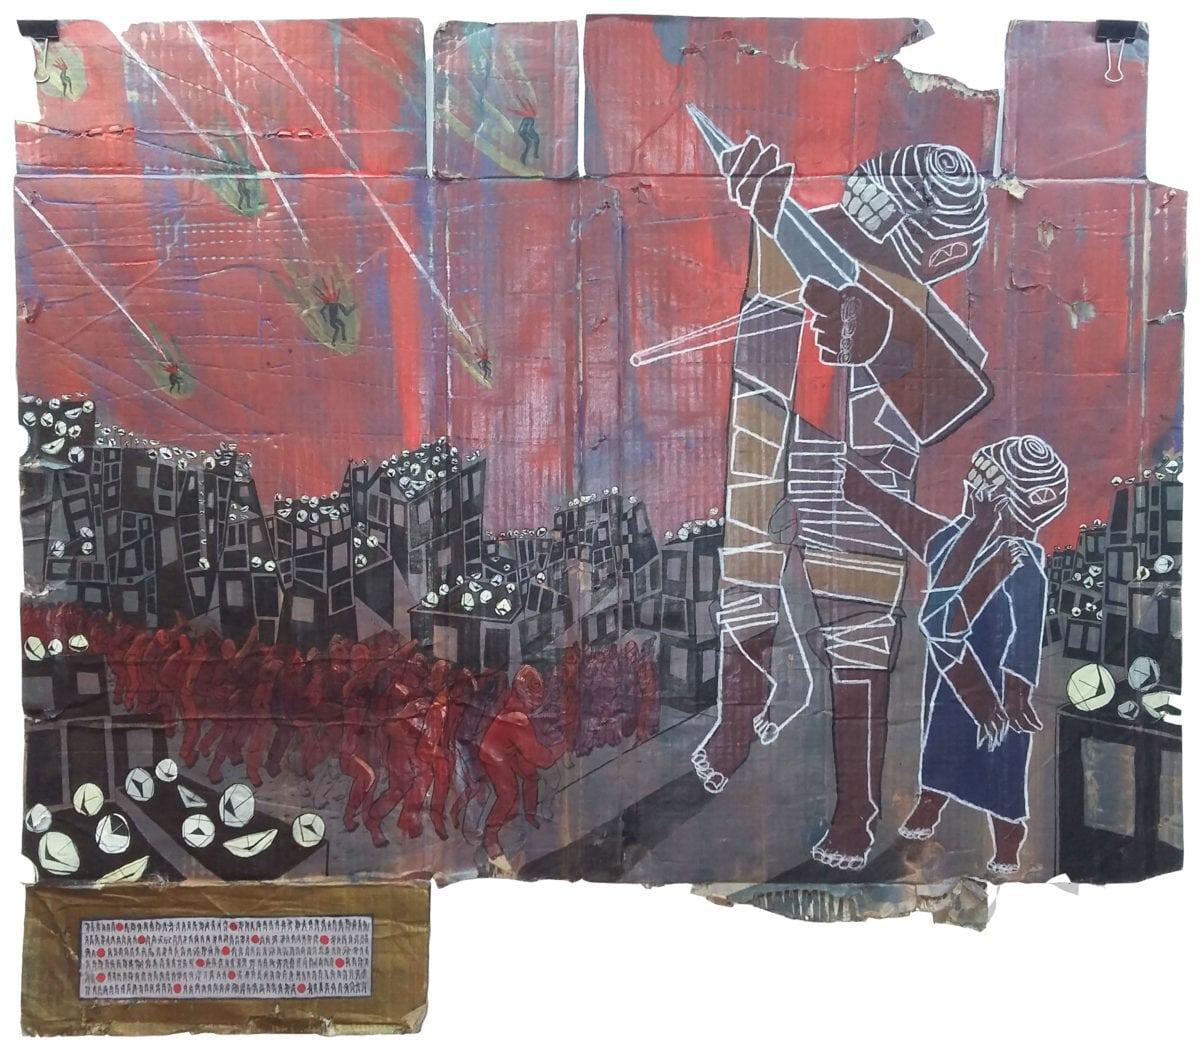 Ali Abdel Mohsen, Slow War with Mashrabia Gallery of Contemporary Art, Cairo